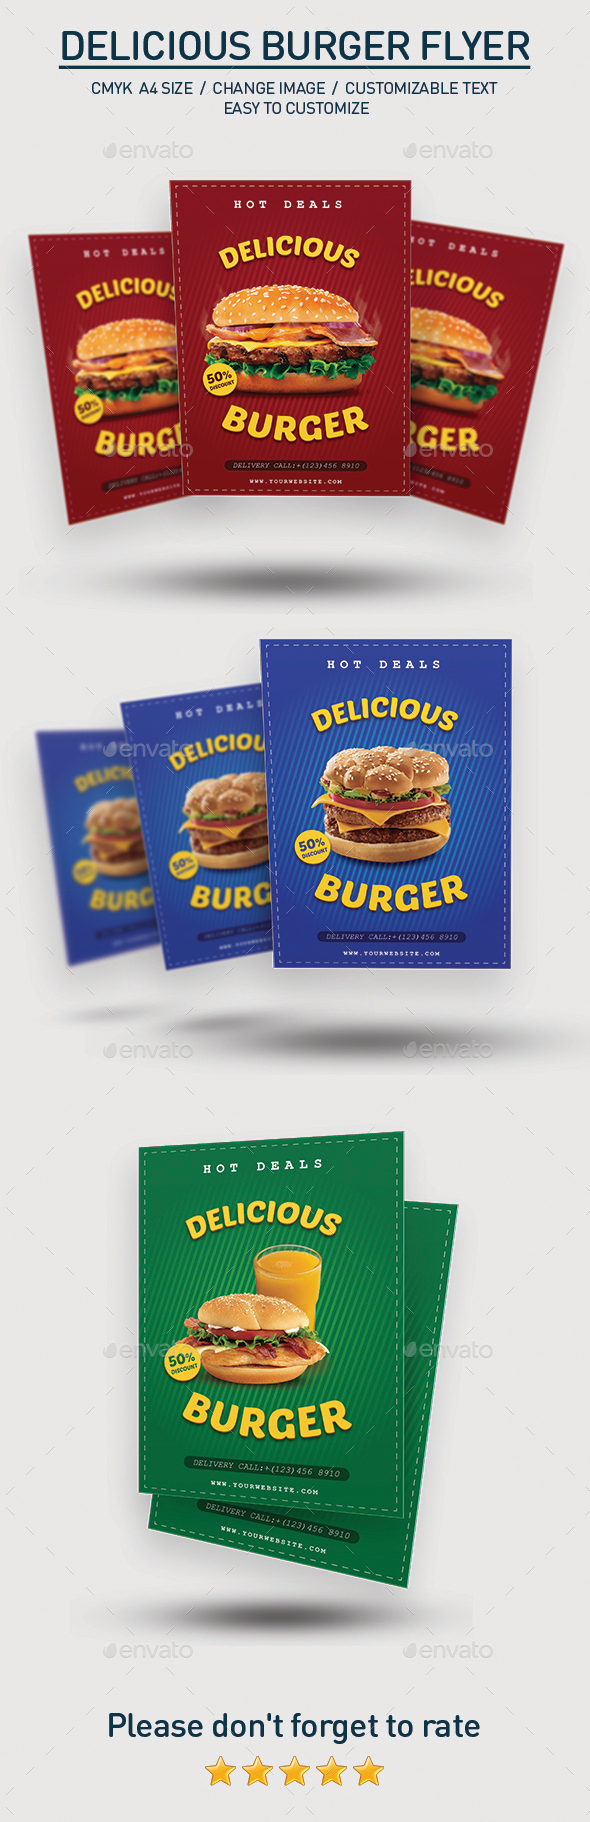 Delicious Burger Flyer - Restaurant Flyers